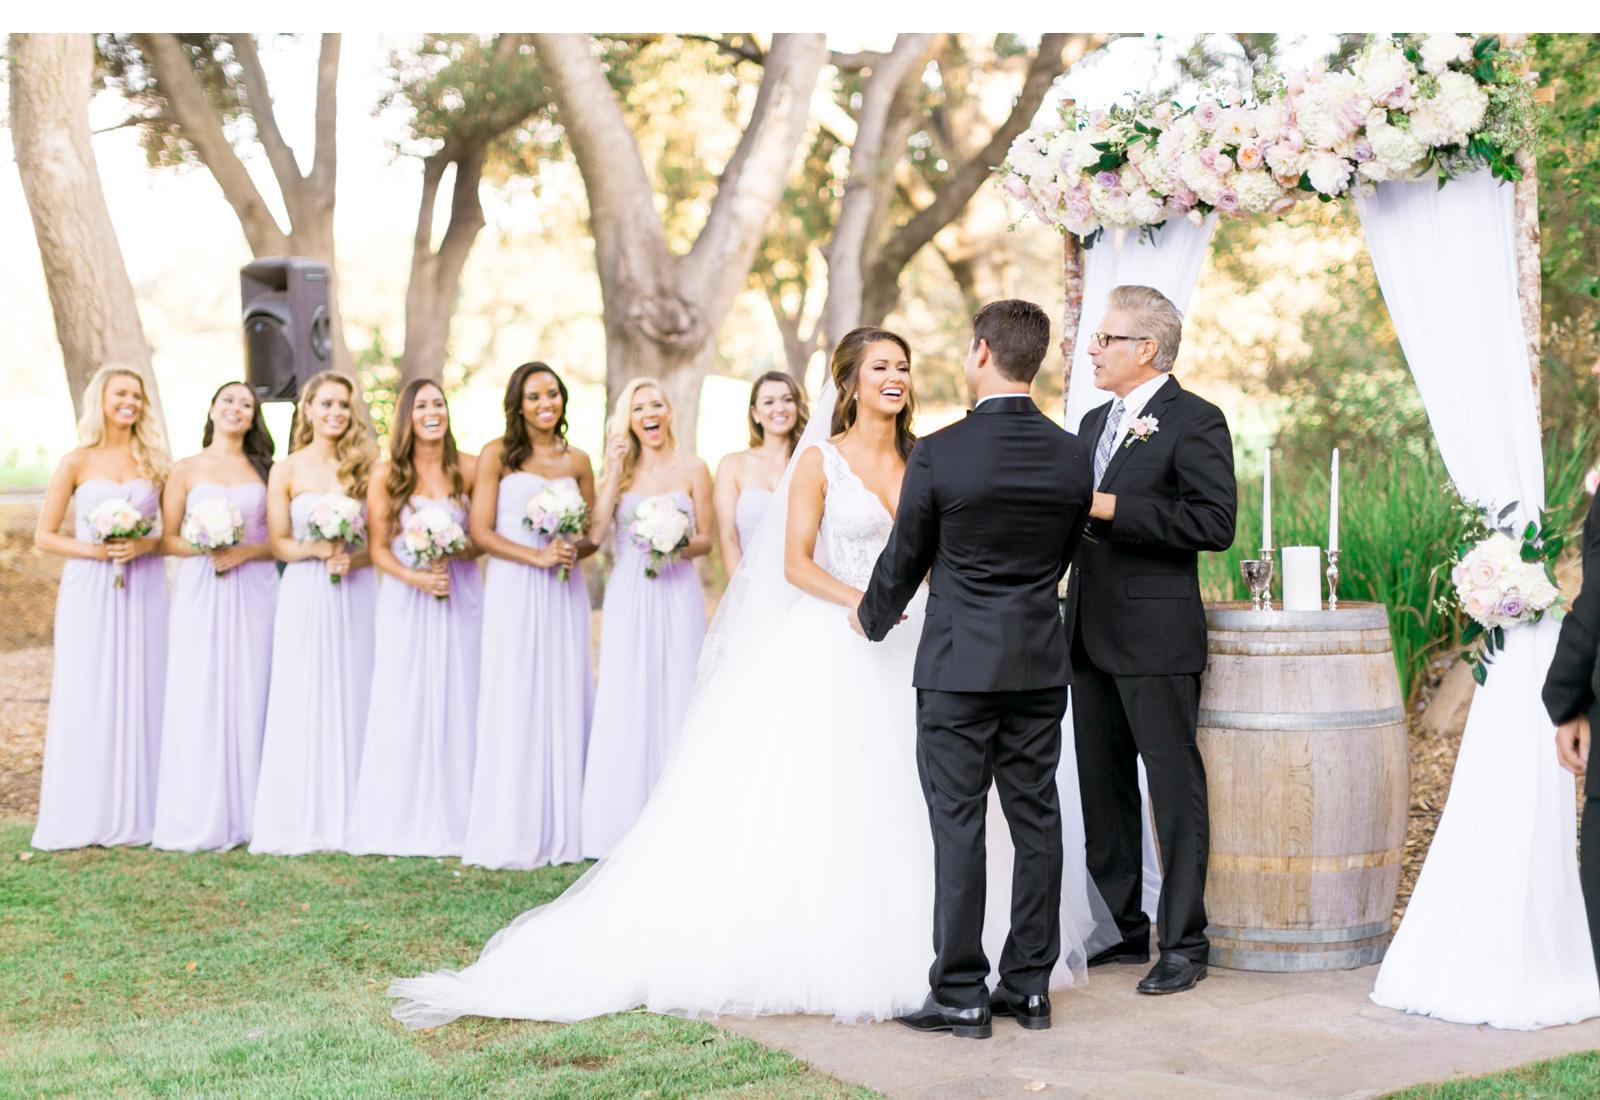 Nia-Sanchez-Miss-USA-Temecula-Wedding-Natalie-Schutt-Photography_05.jpg